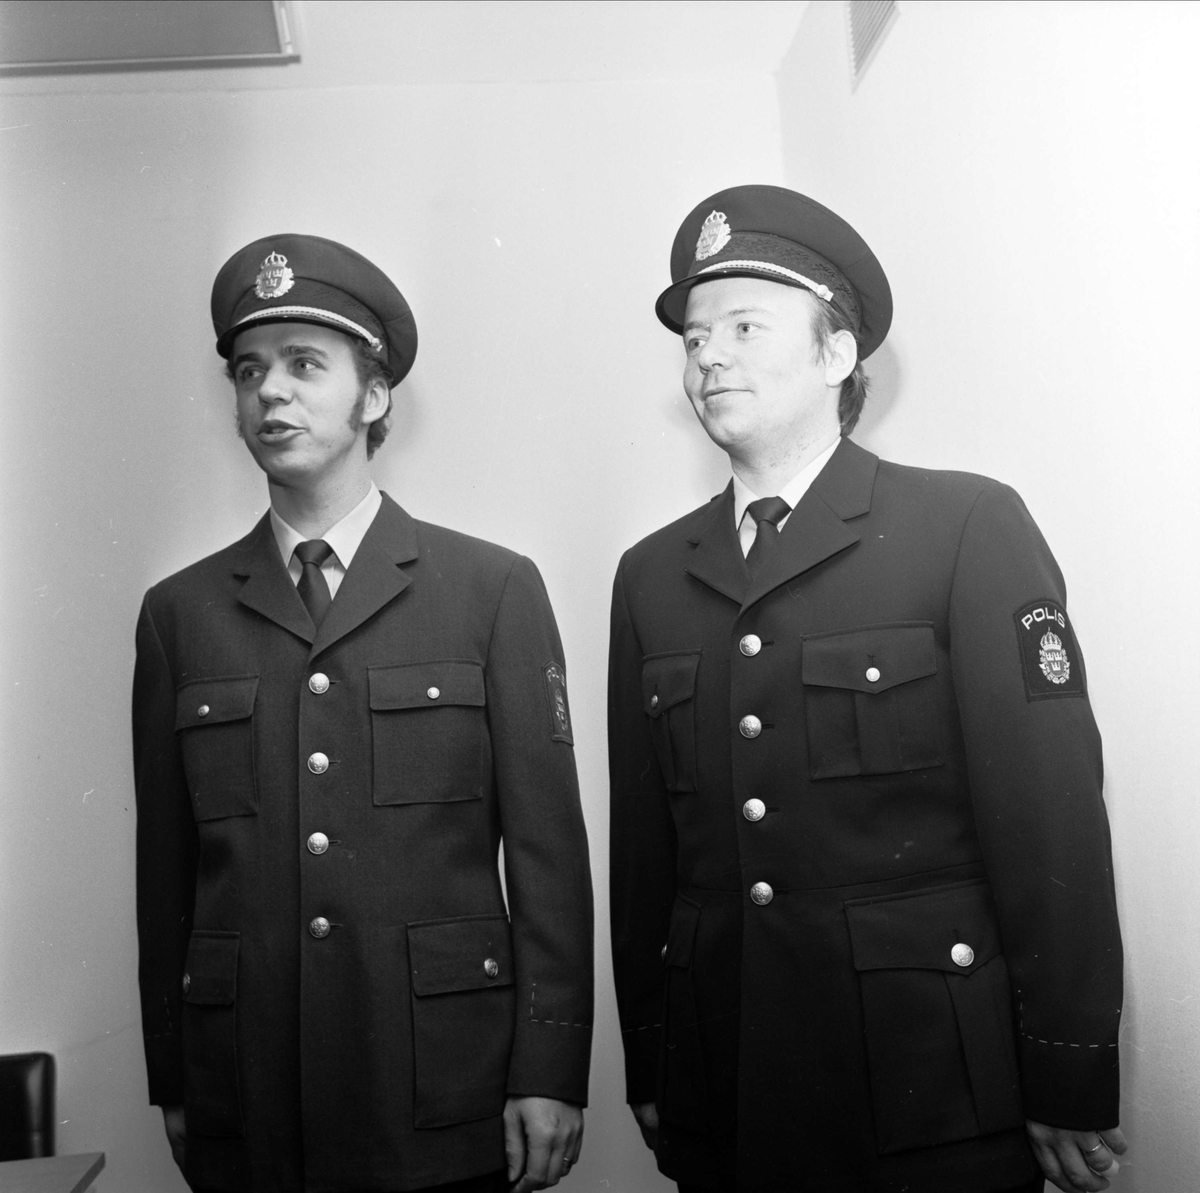 Tierpspolisen provade nya uniformer, Tierp, Uppland december 1972